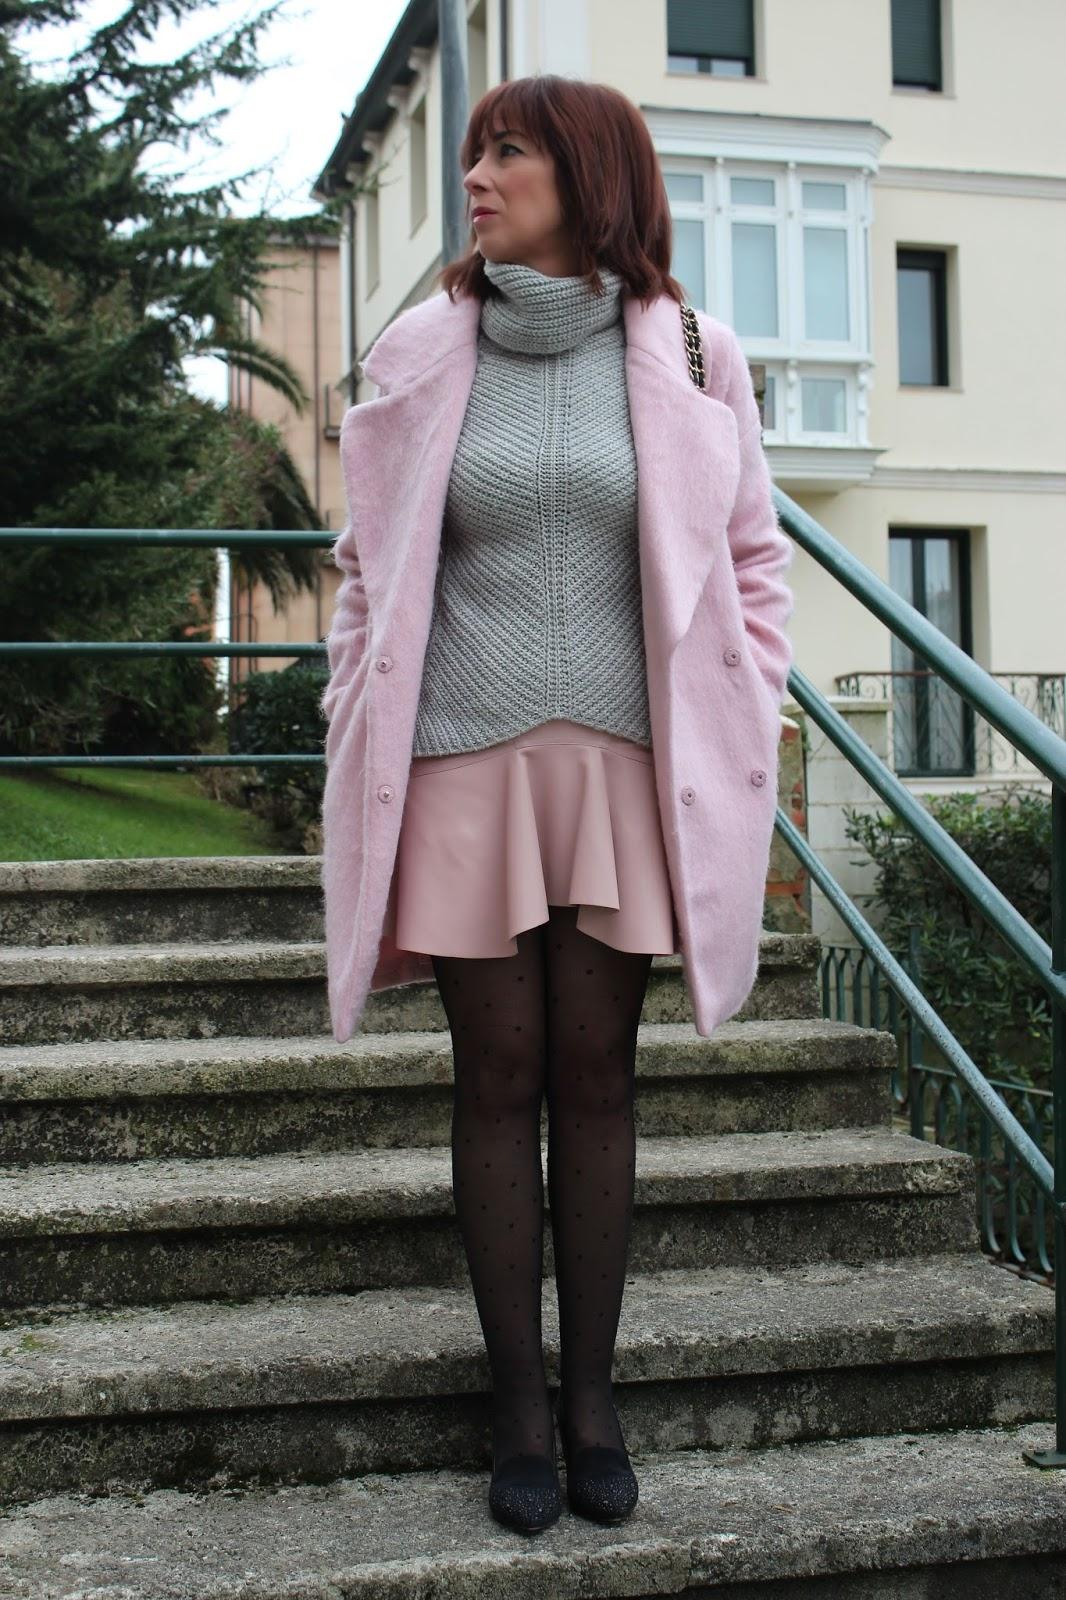 Br jula de estilo mis looks rosa y gris - Brujula de estilo ...